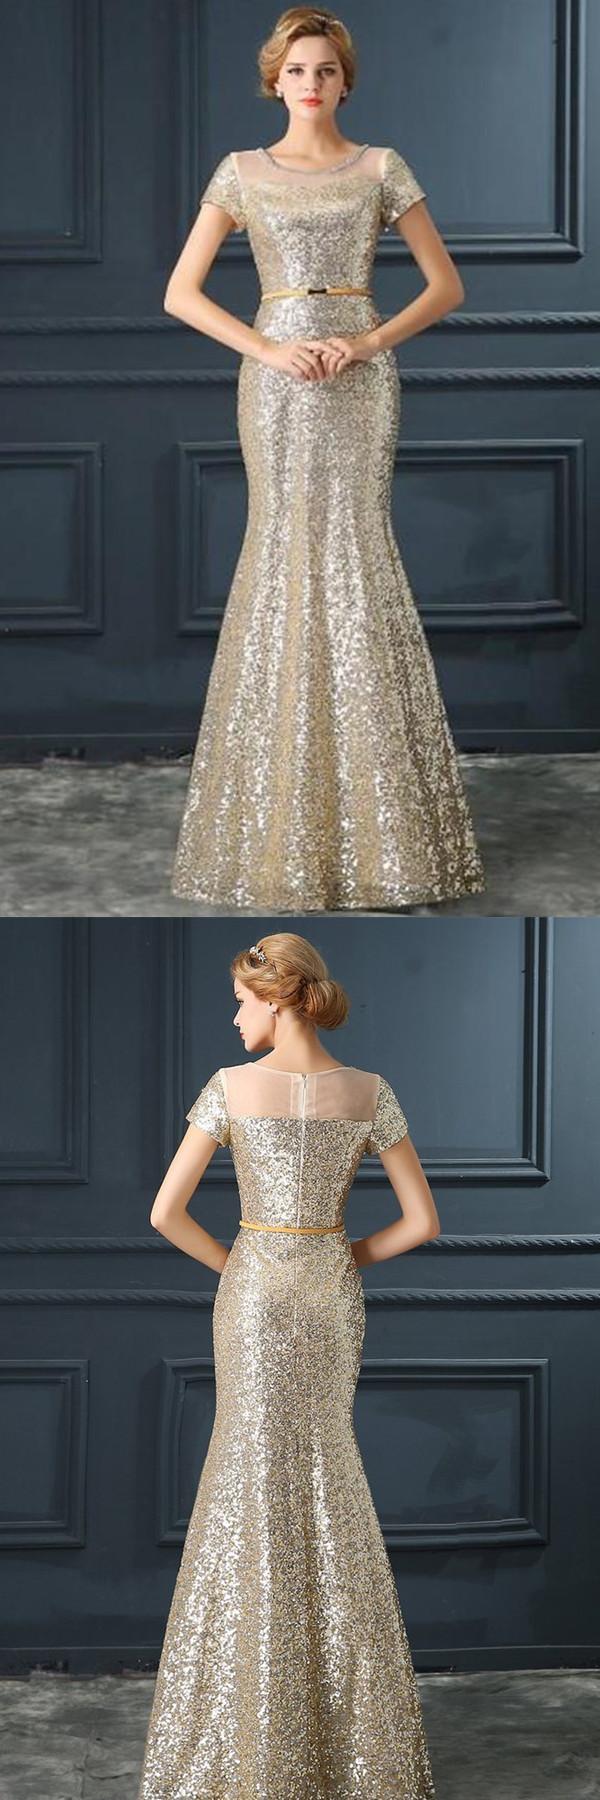 Stunning jewel short sleeves floor length sequined mermaid prom